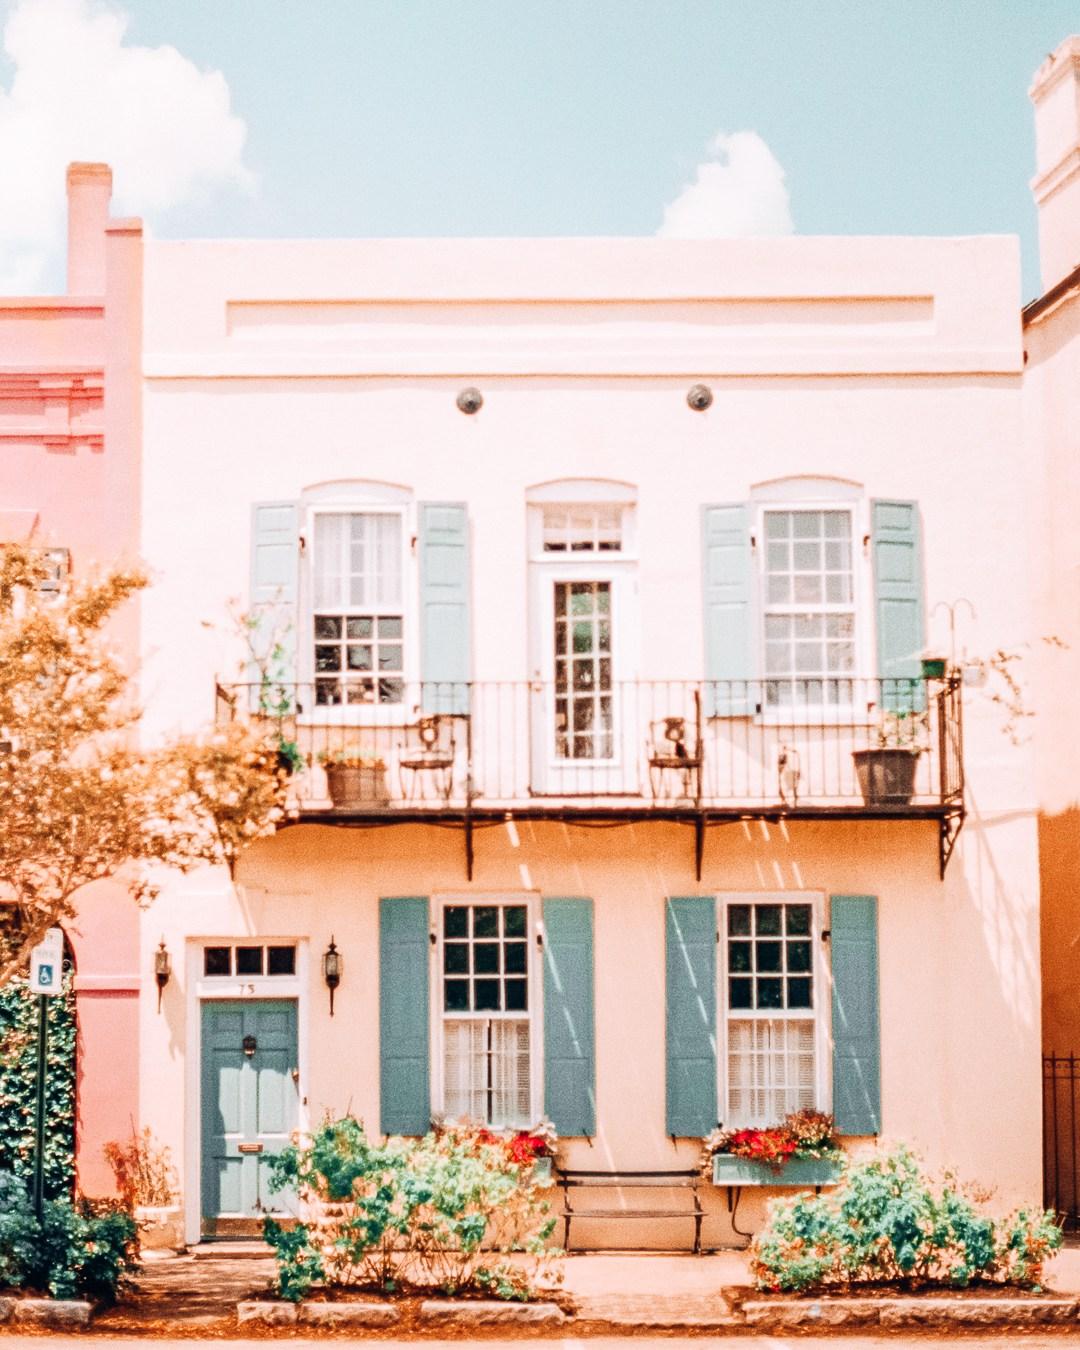 Photogenic house of Rainbow Row in Charleston